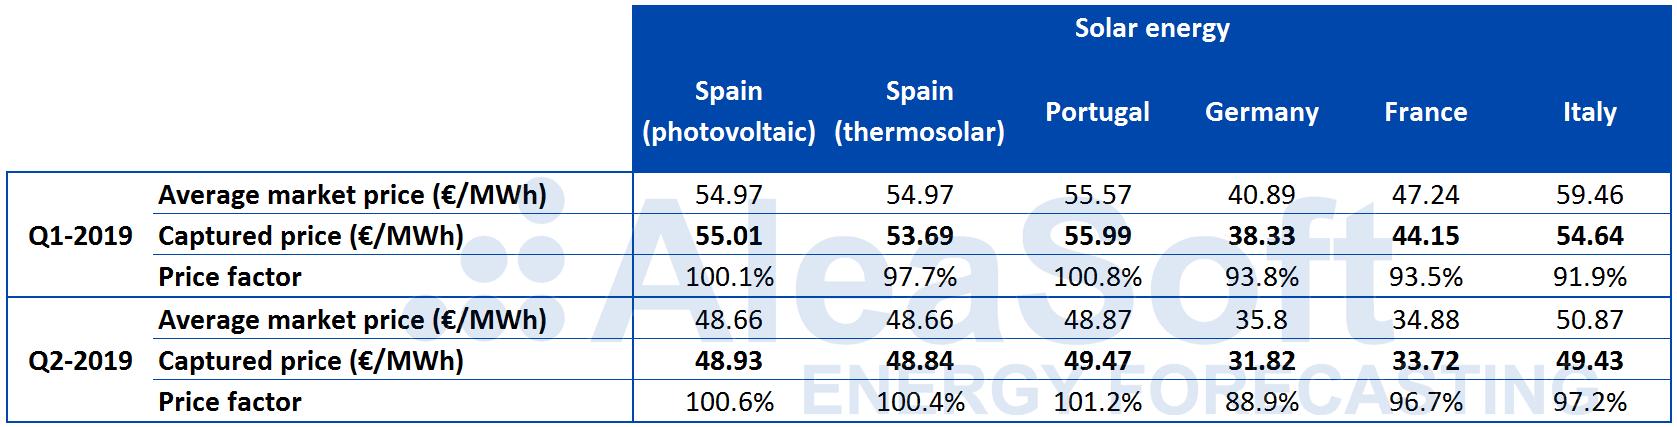 AleaSoft - Table solar photovoltaics thermosolar captured price Europe